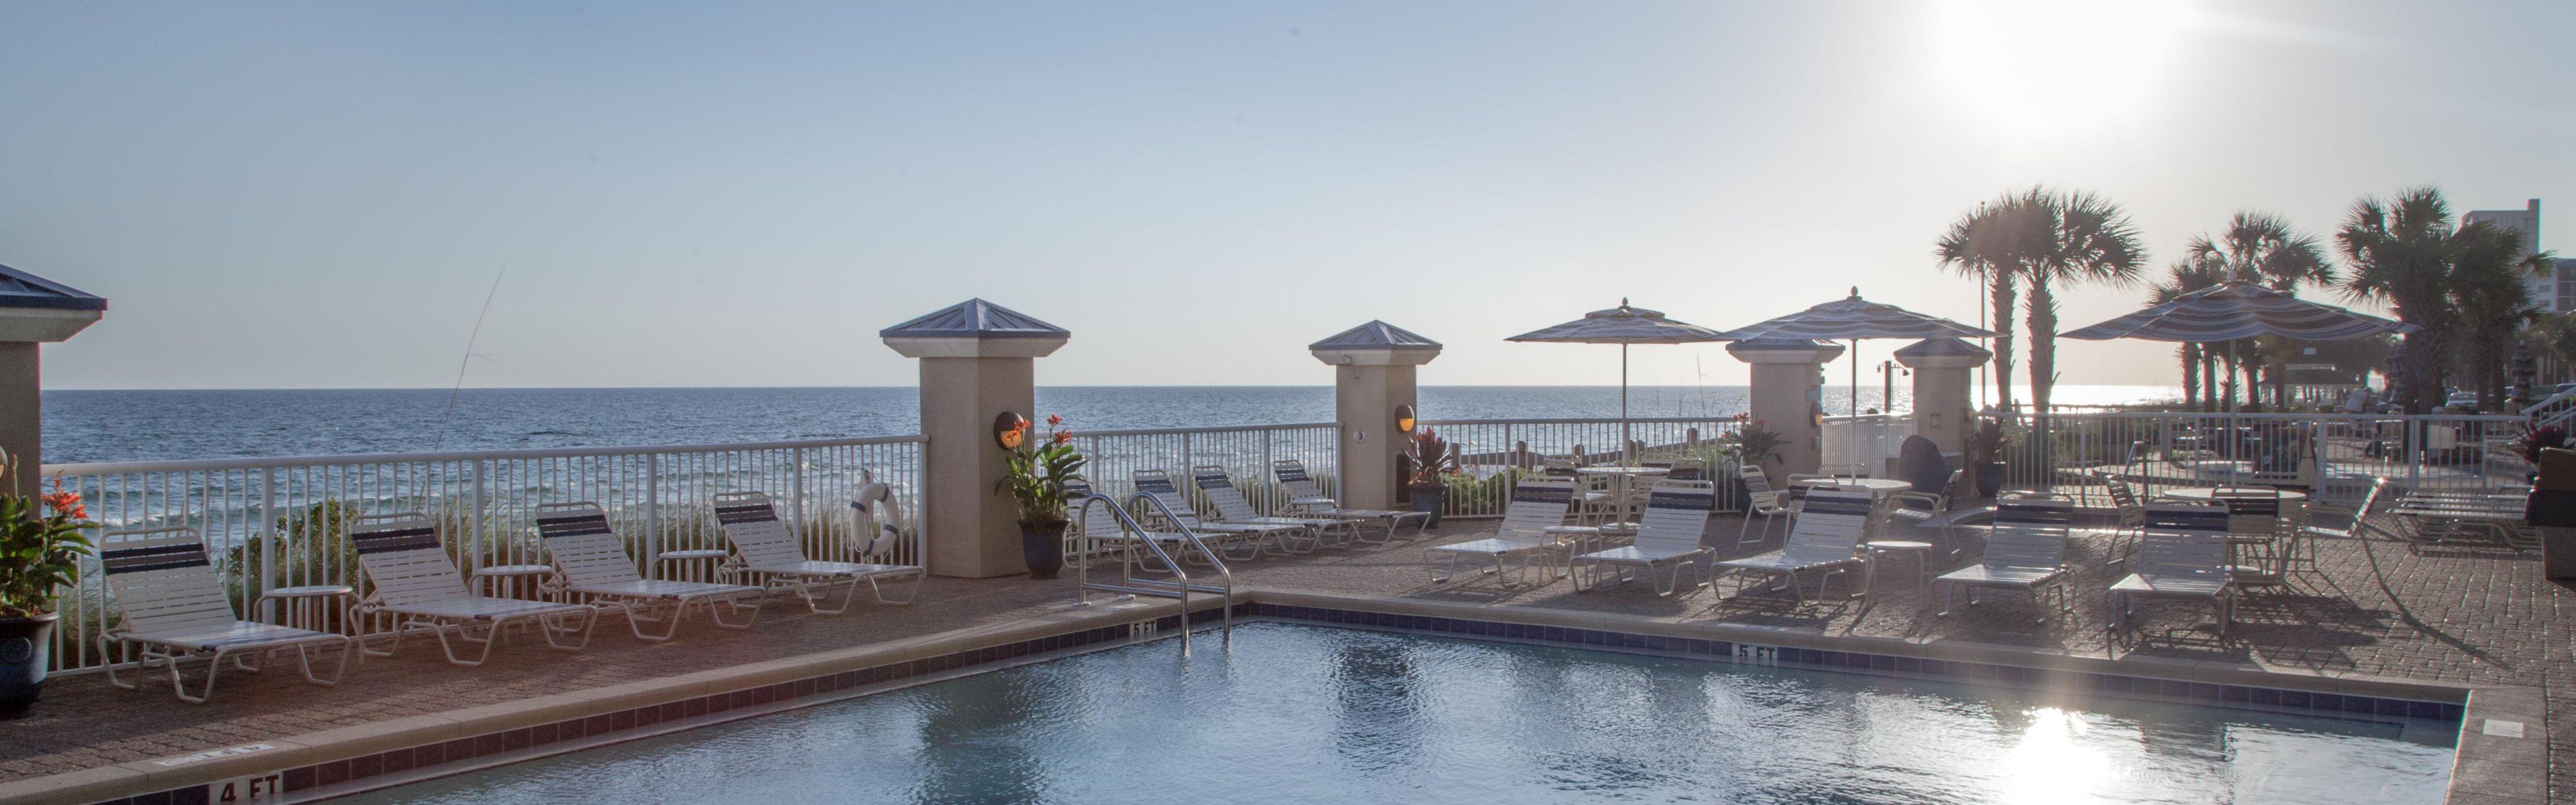 Holiday Inn Club Vacations Panama City Beach Resort image 2